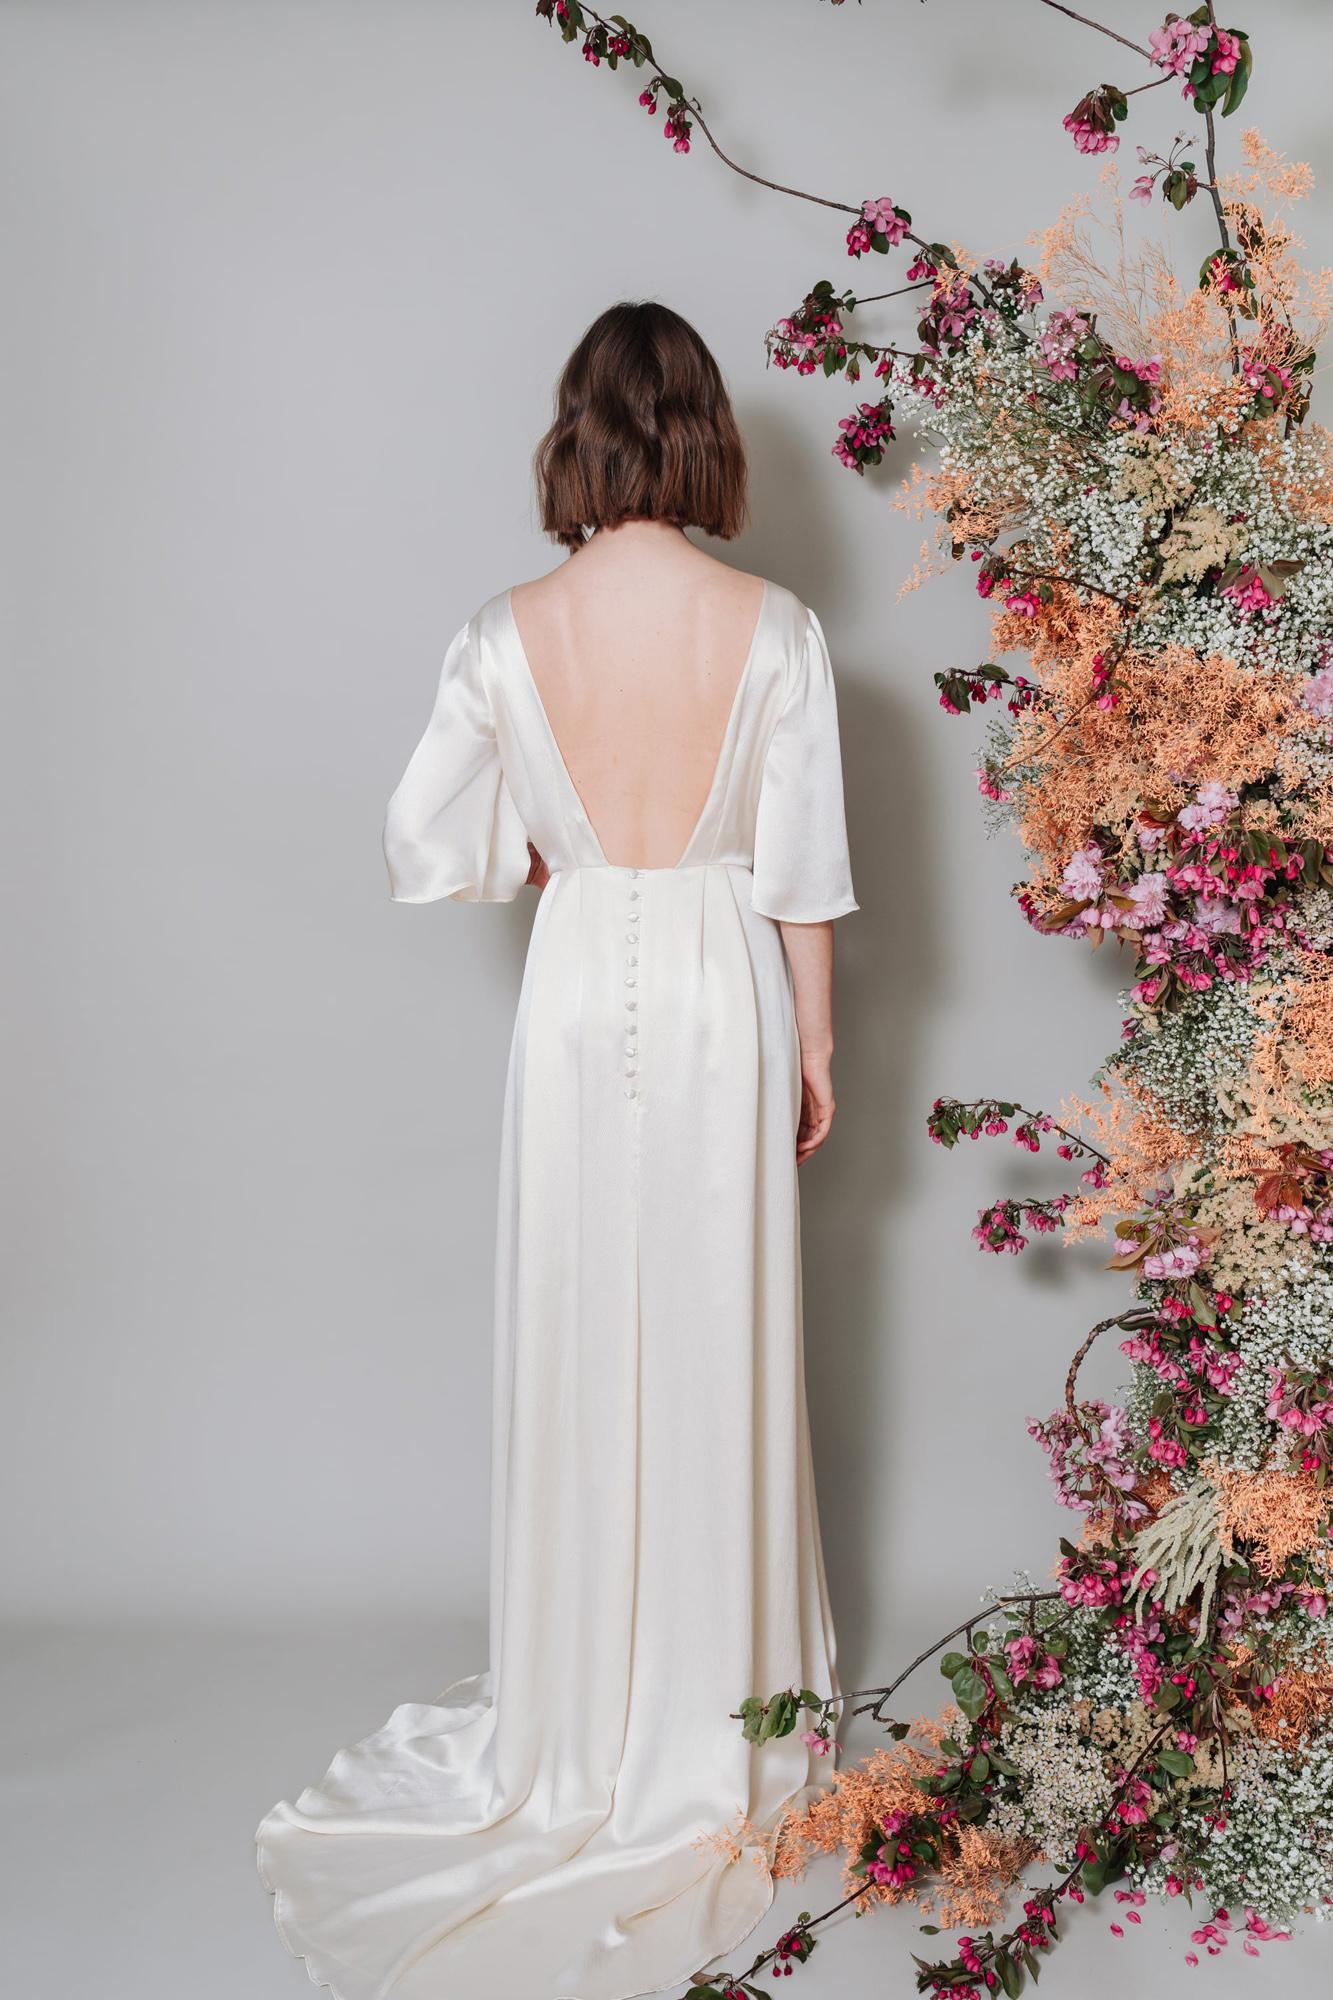 Kate-Beaumont-Lunaria-Bohemian-Hammered-Silk-Wedding-Dress-Sleeves-14.jpg